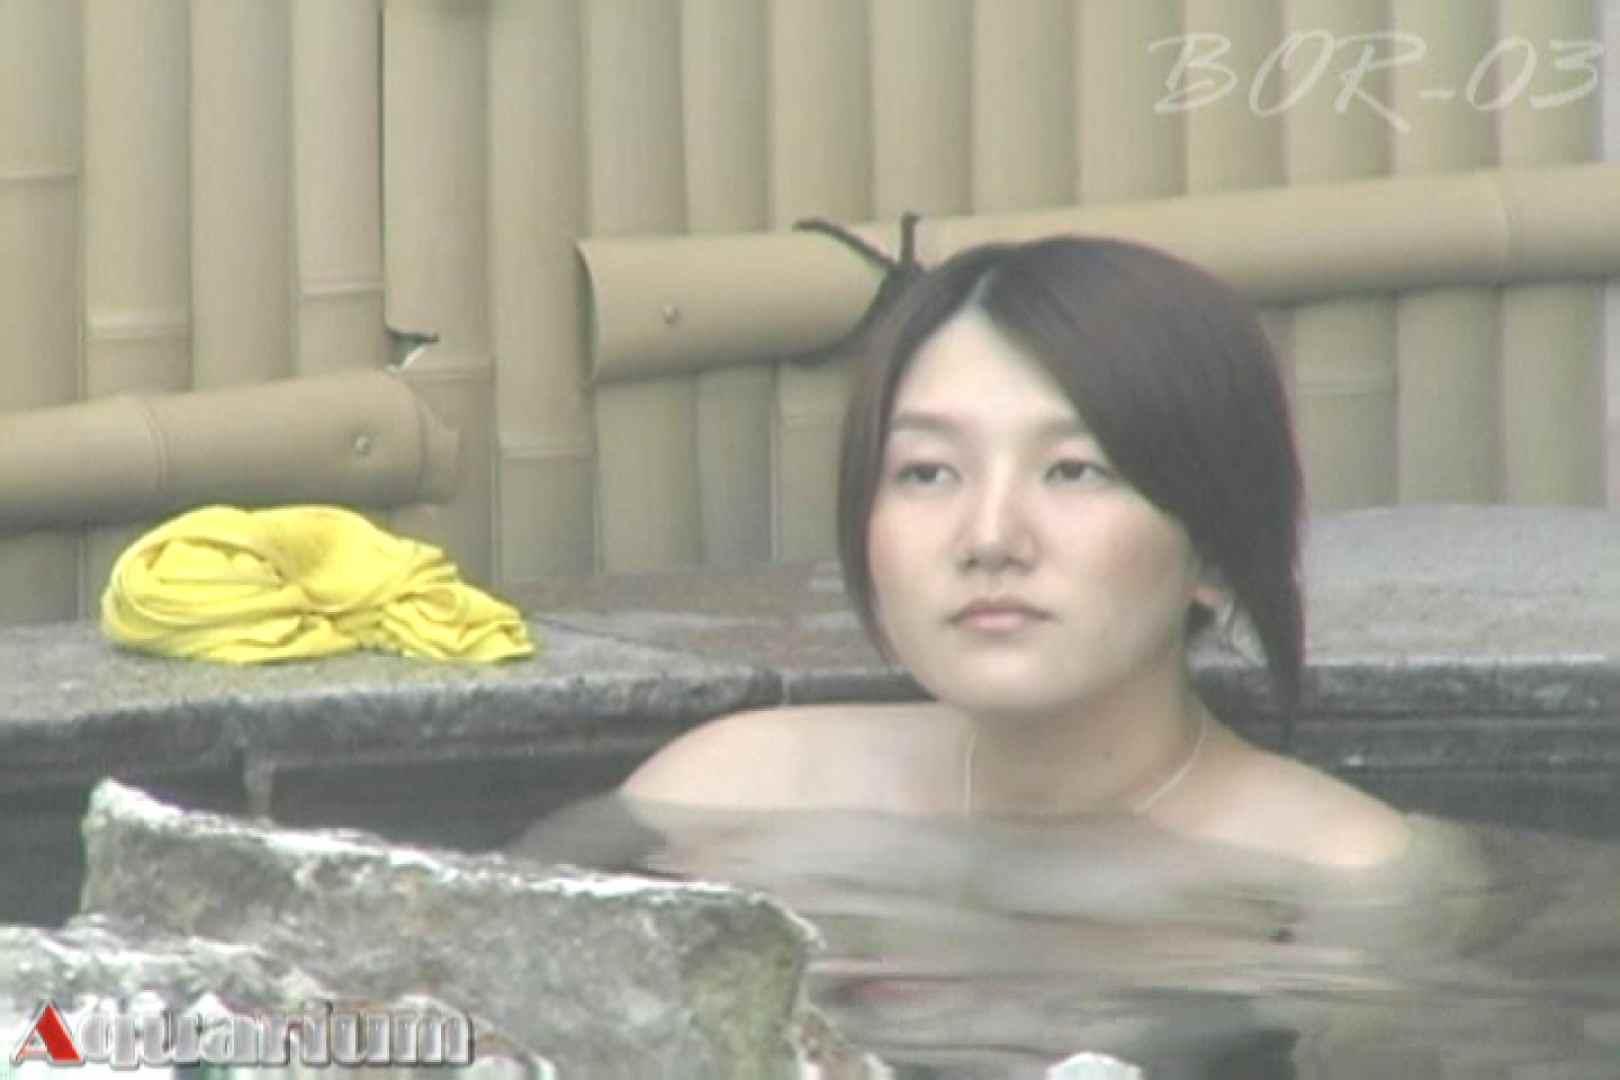 Aquaな露天風呂Vol.487 盗撮 おめこ無修正画像 95連発 59